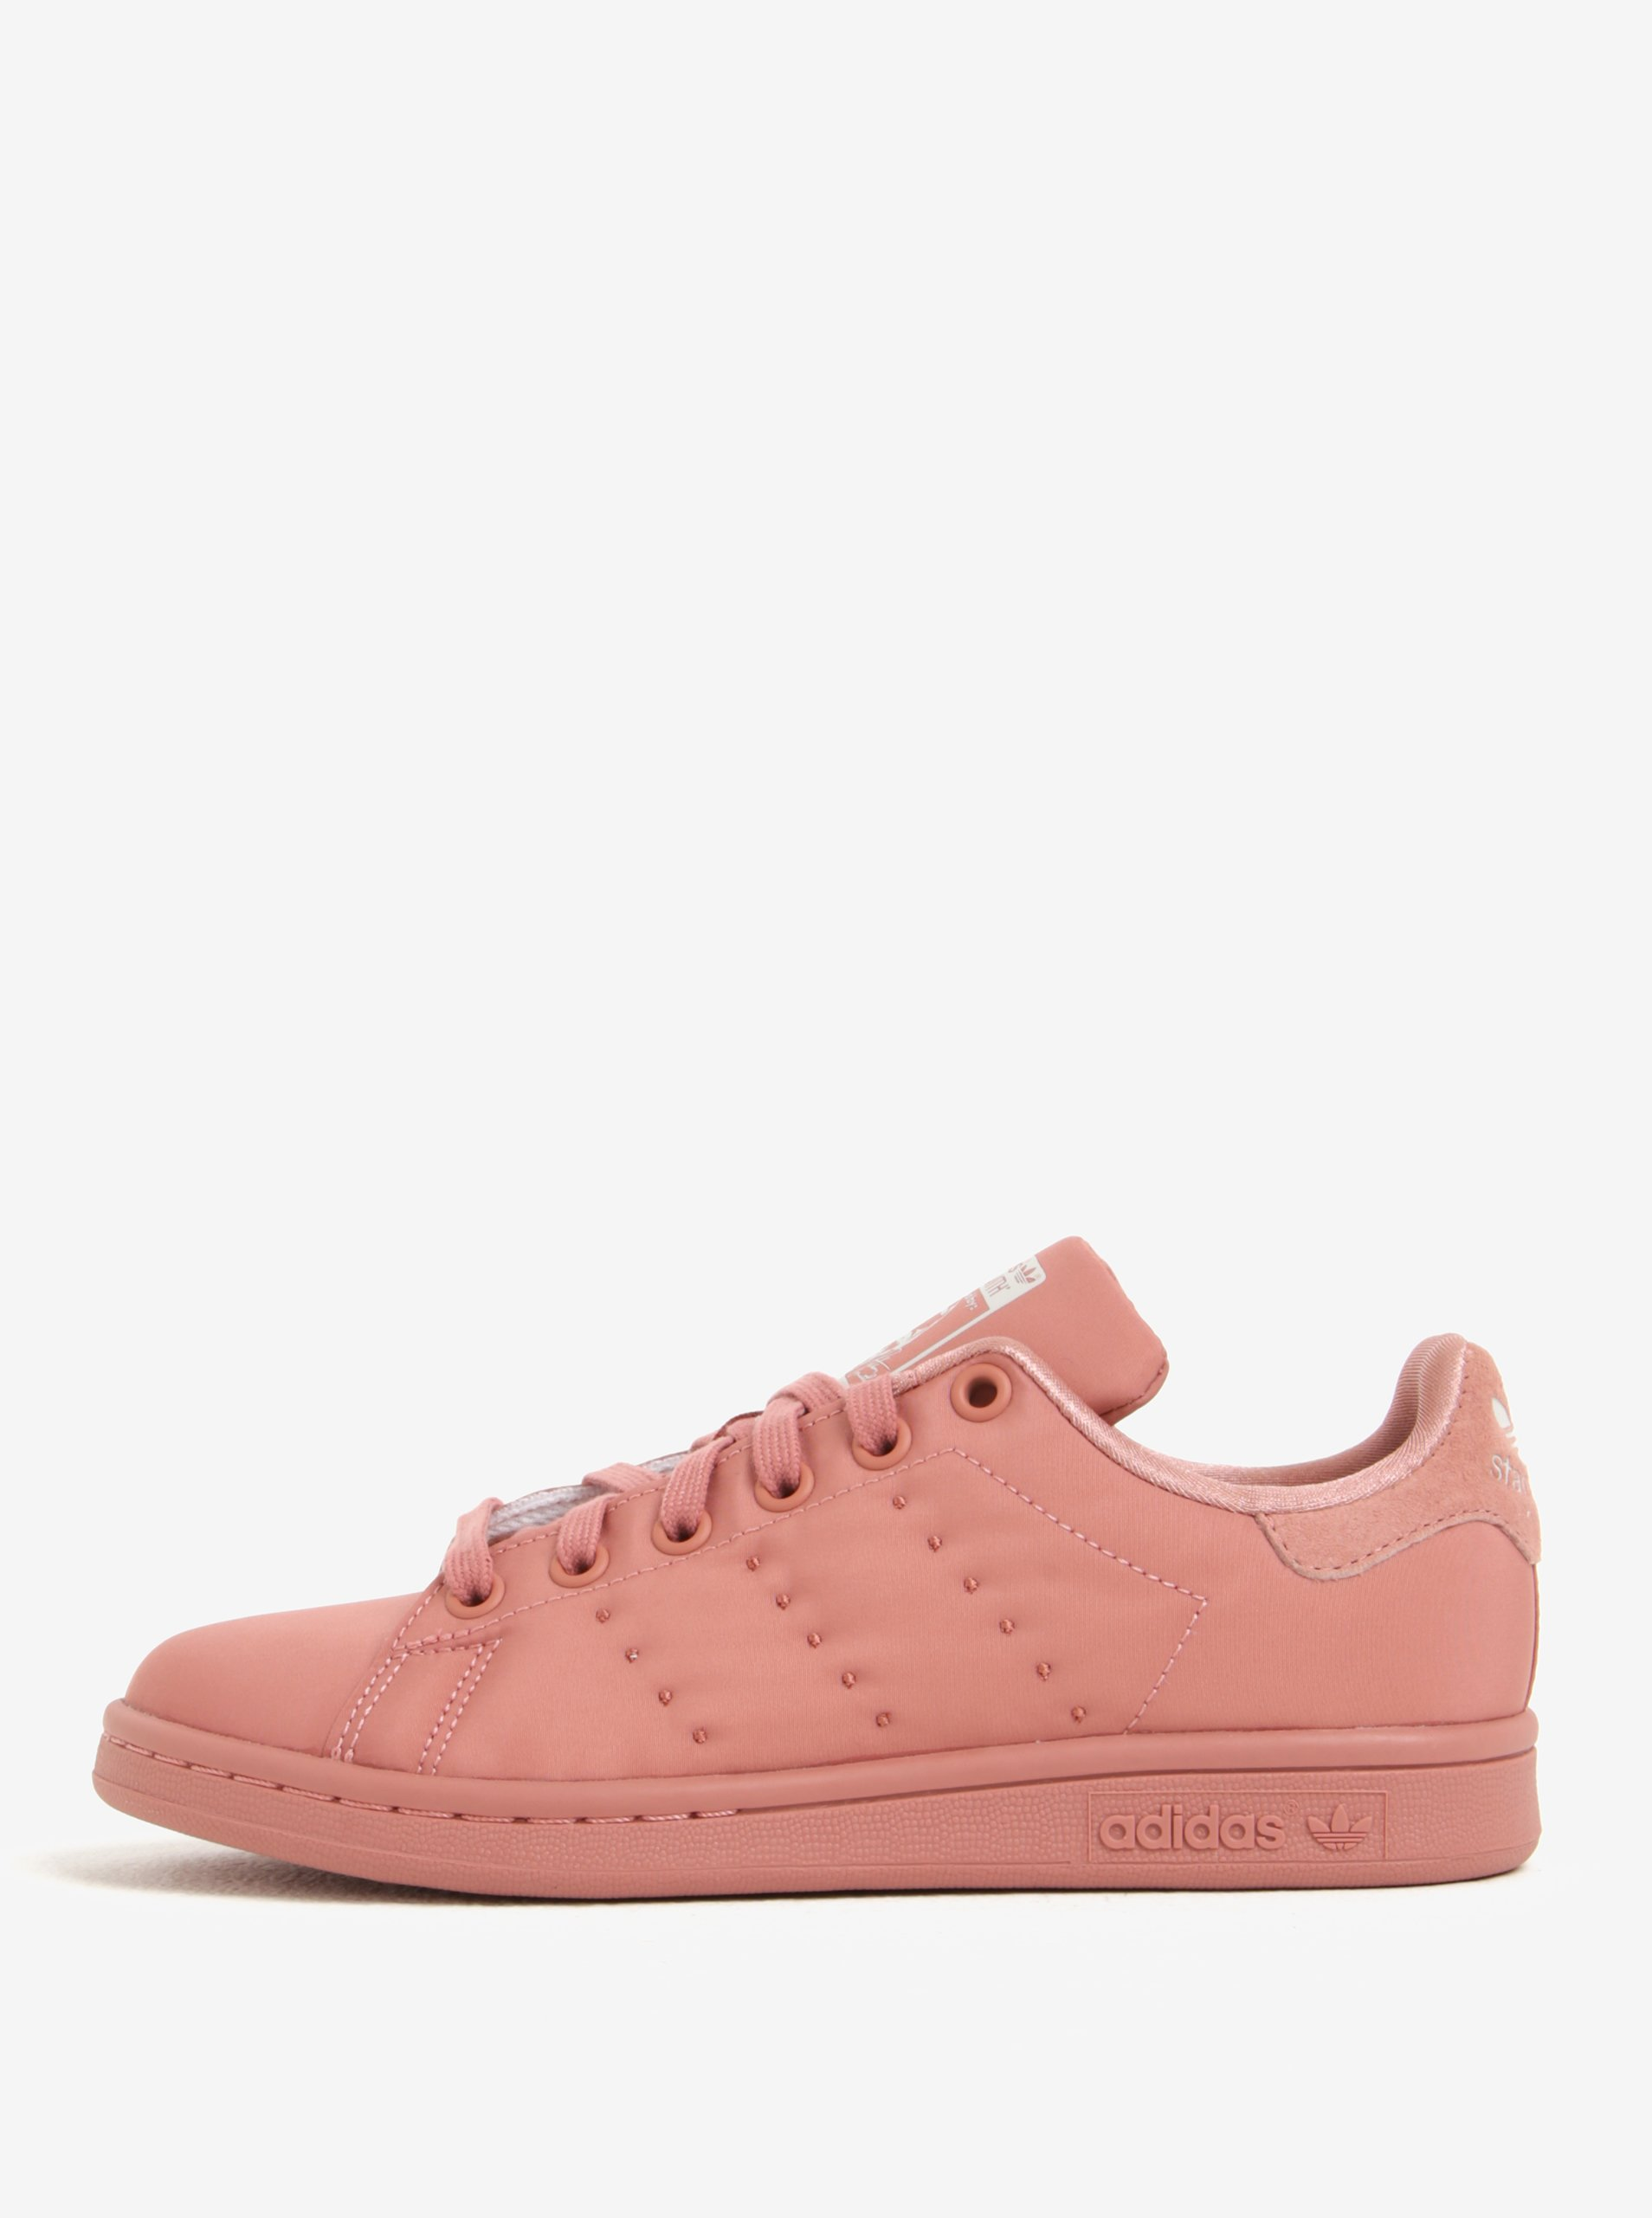 5c4c39021c590 Ružové dámske tenisky adidas Originals Stan Smith | Moda.sk